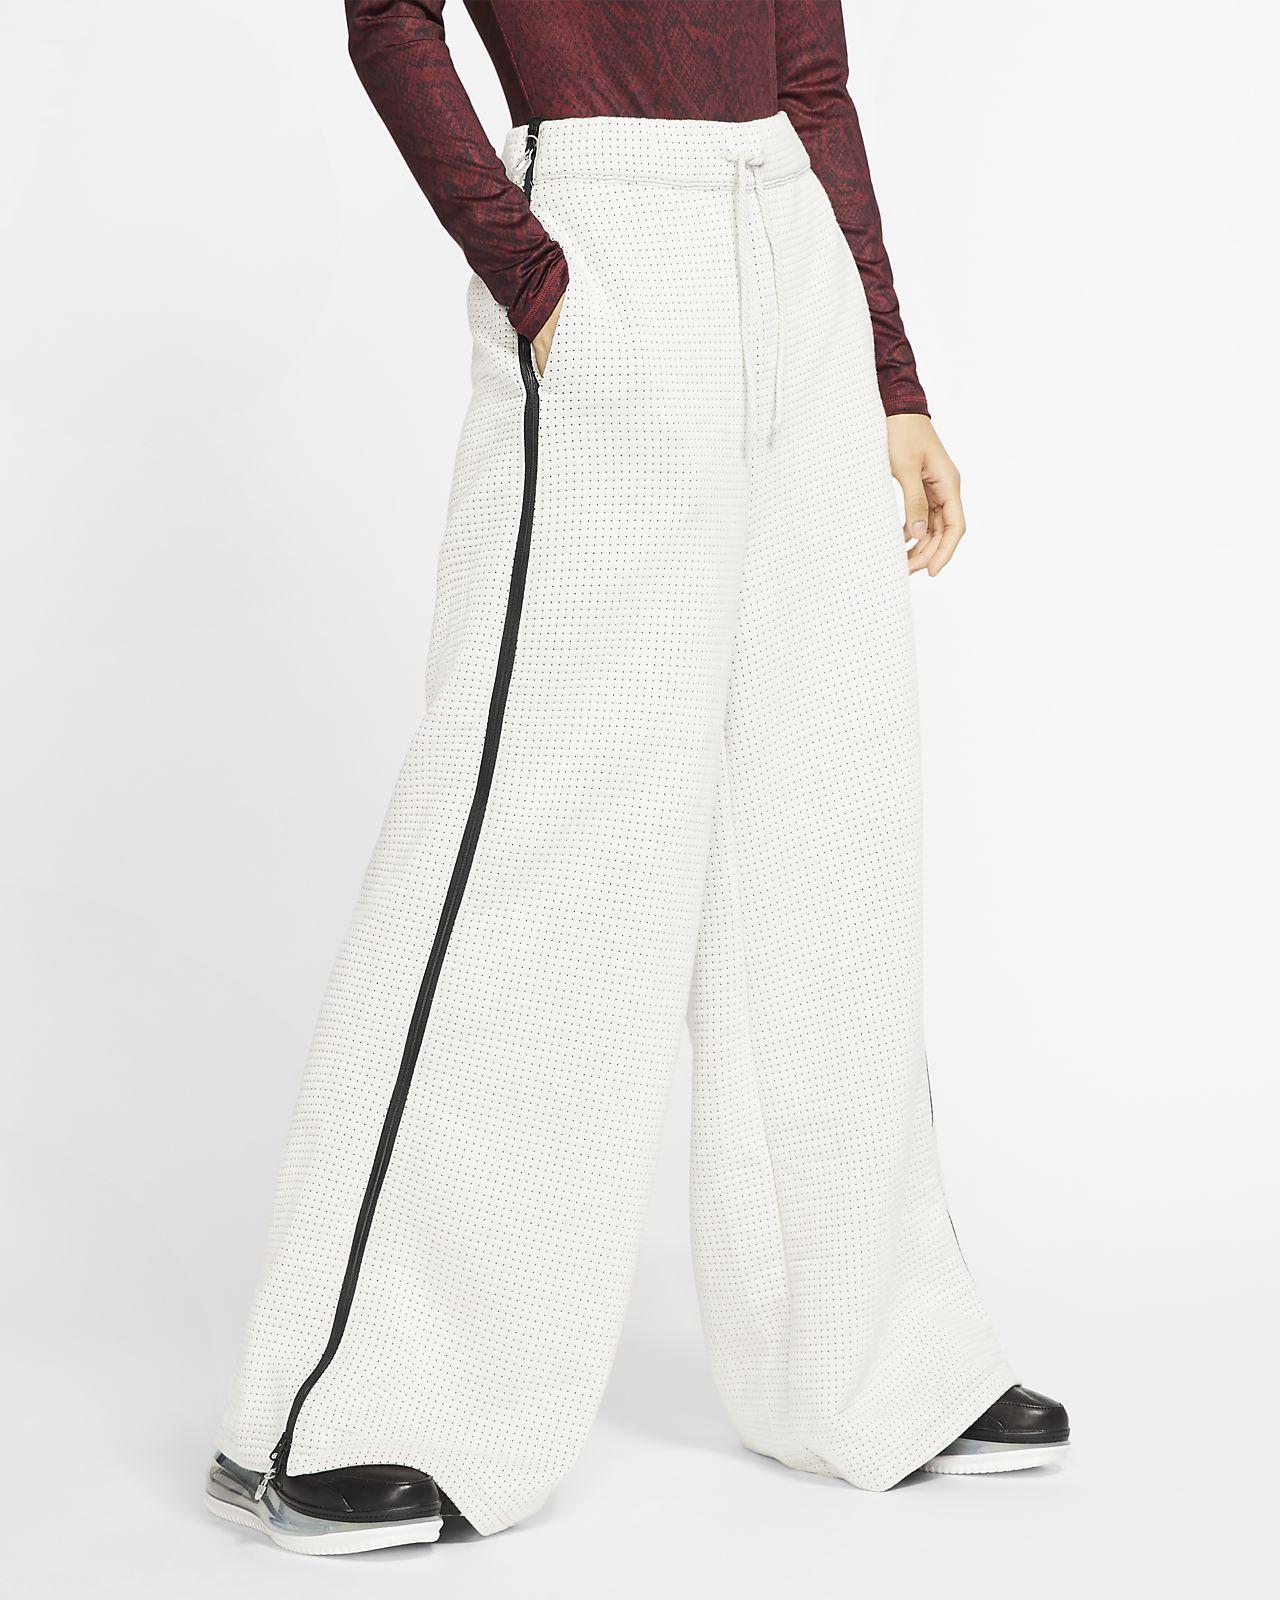 Nike Sportswear City Ready Pantalons de teixit Fleece - Dona